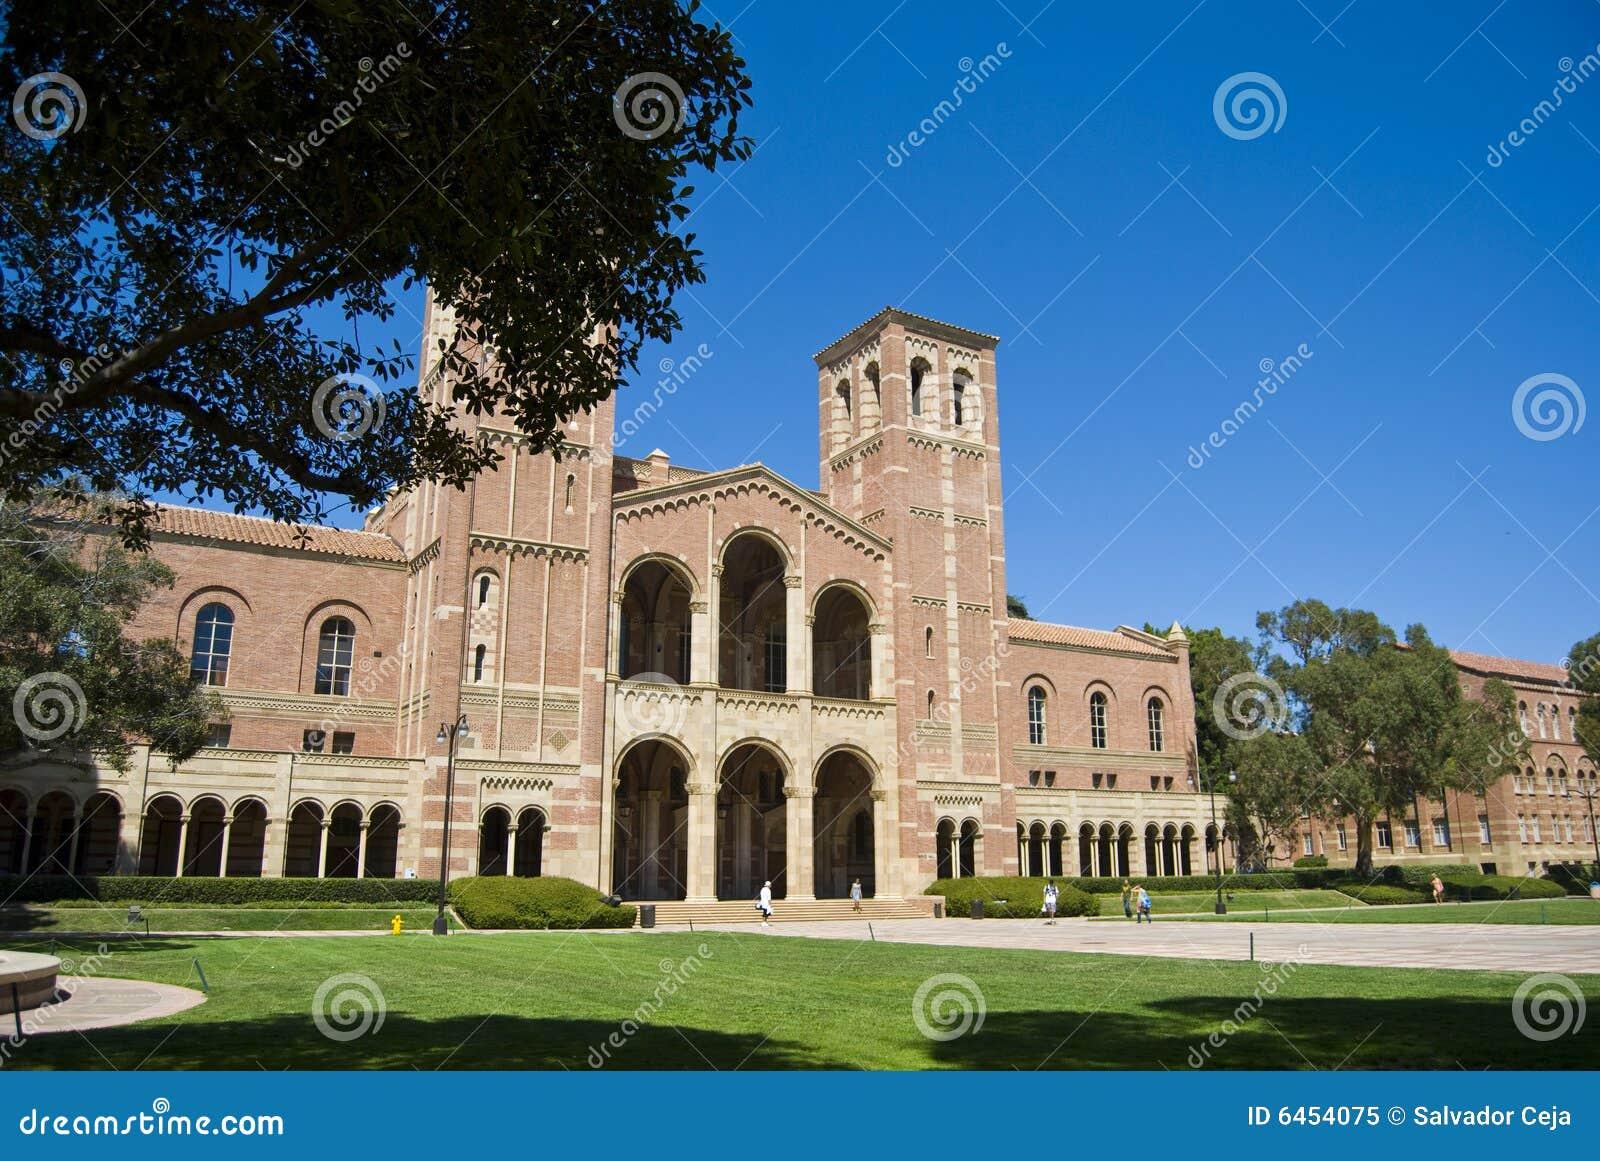 Uniwersytet kalifornii kampusu